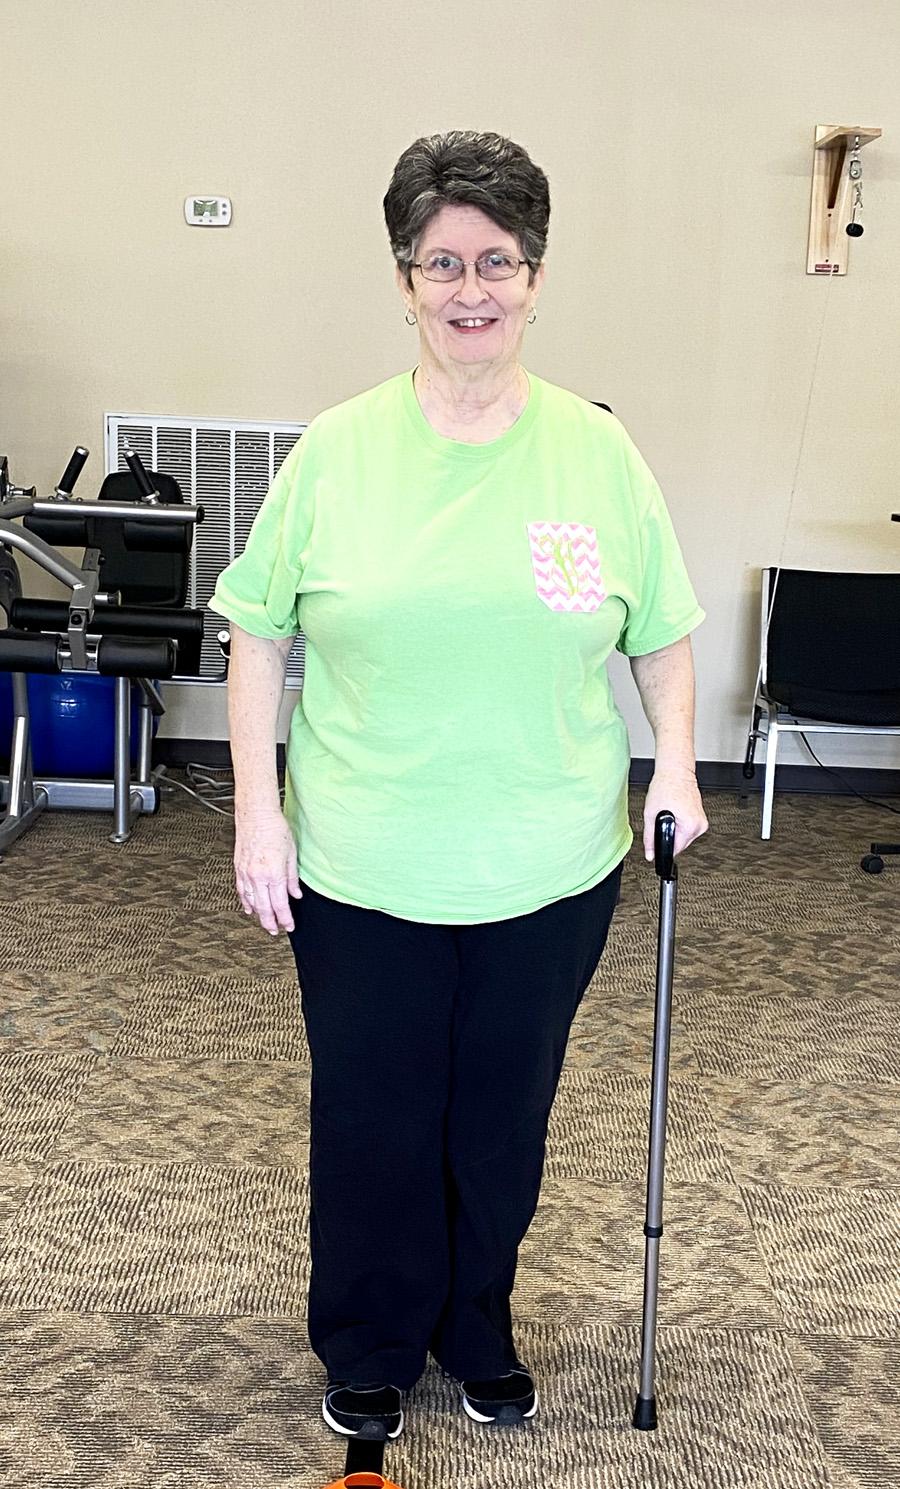 Vickie Franks is Patient of the Month for Encore Rehabilitation-Hamilton